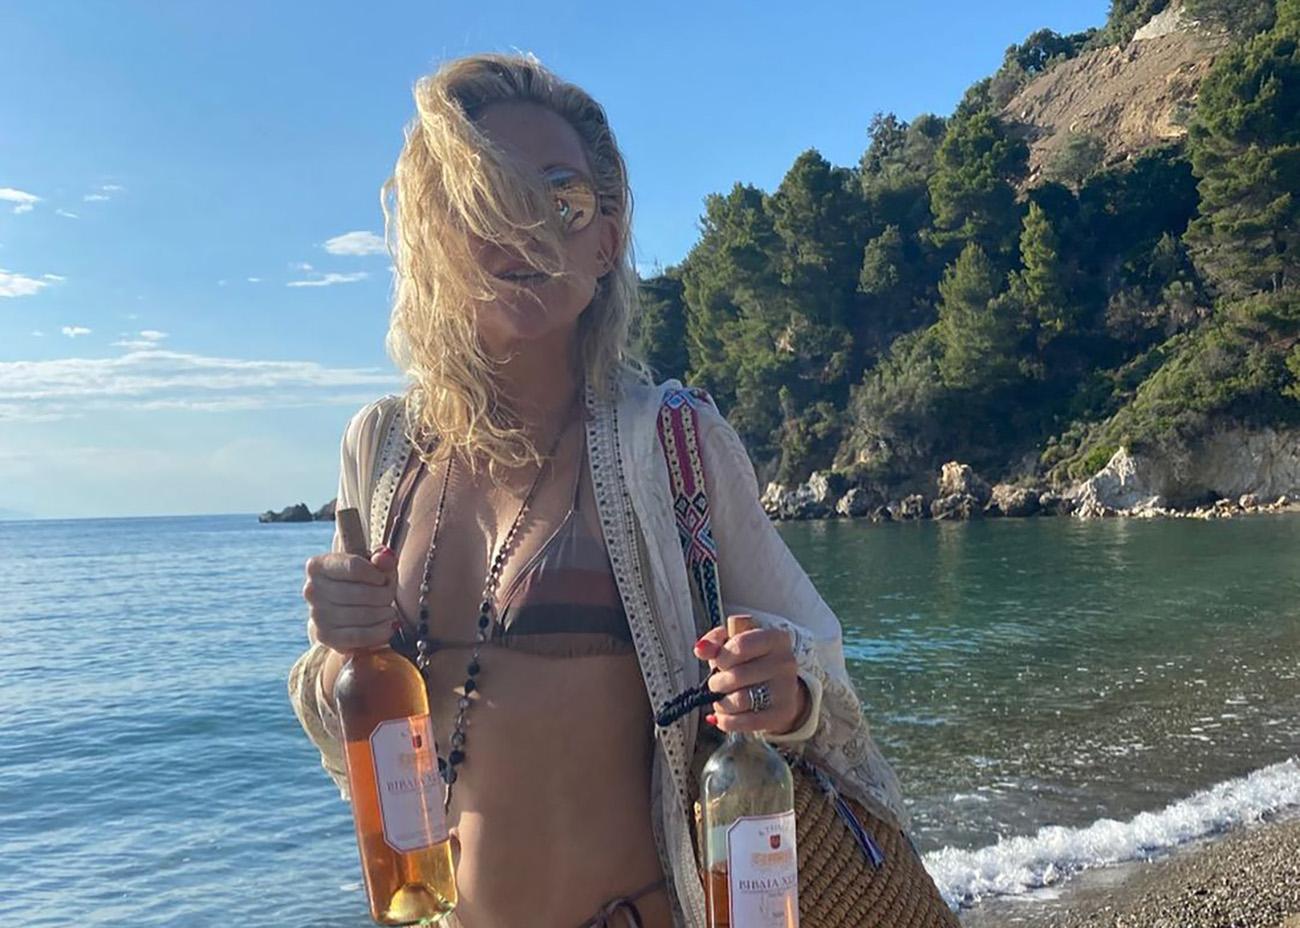 Kate Hudson: Καλοκαίρι για πάντα στη Σκιάθο – Οι αναρτήσεις στο Instagram